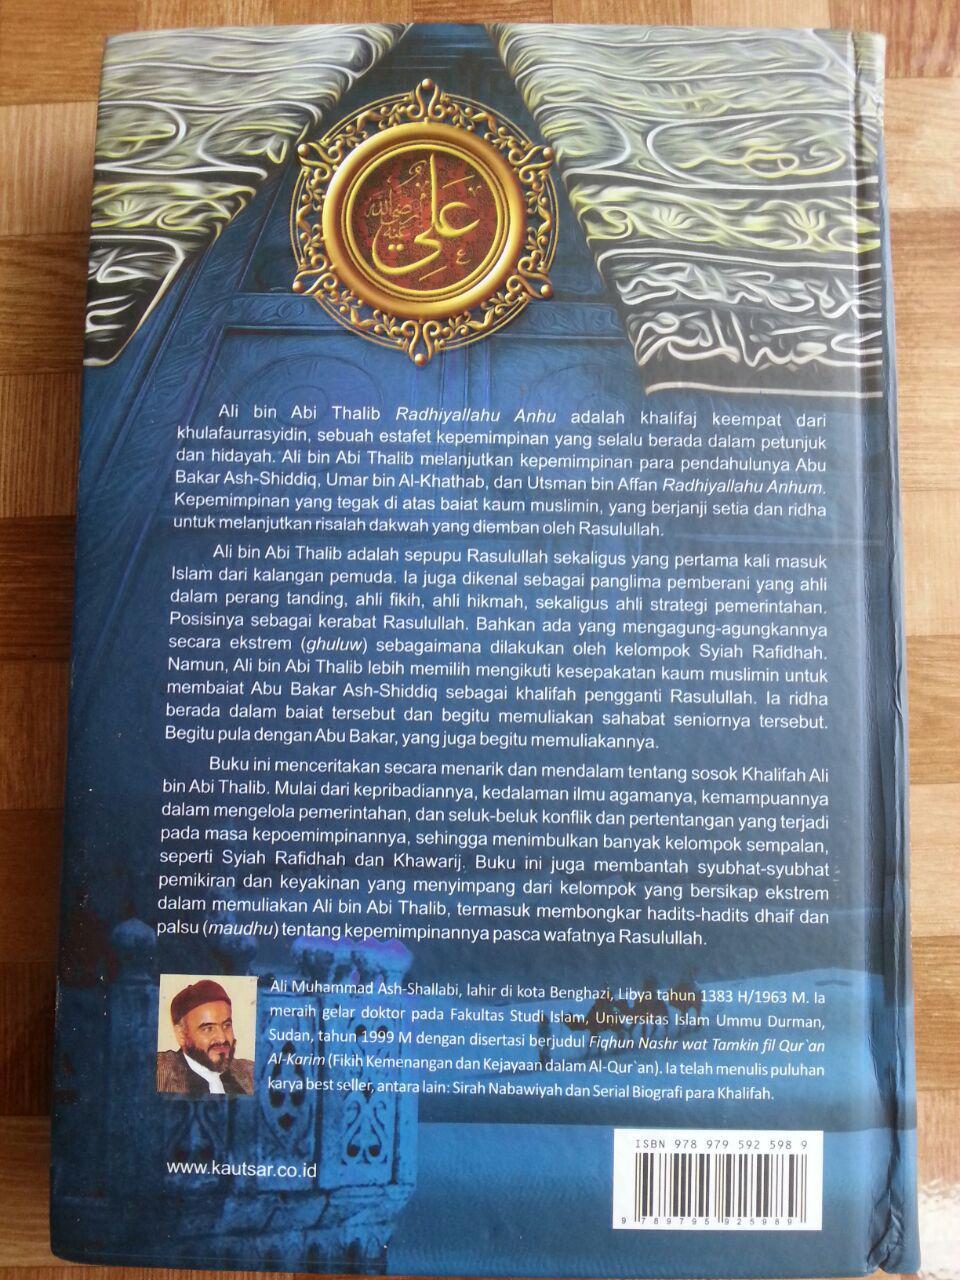 Buku Biografi Ali bin Abi Thalib cover